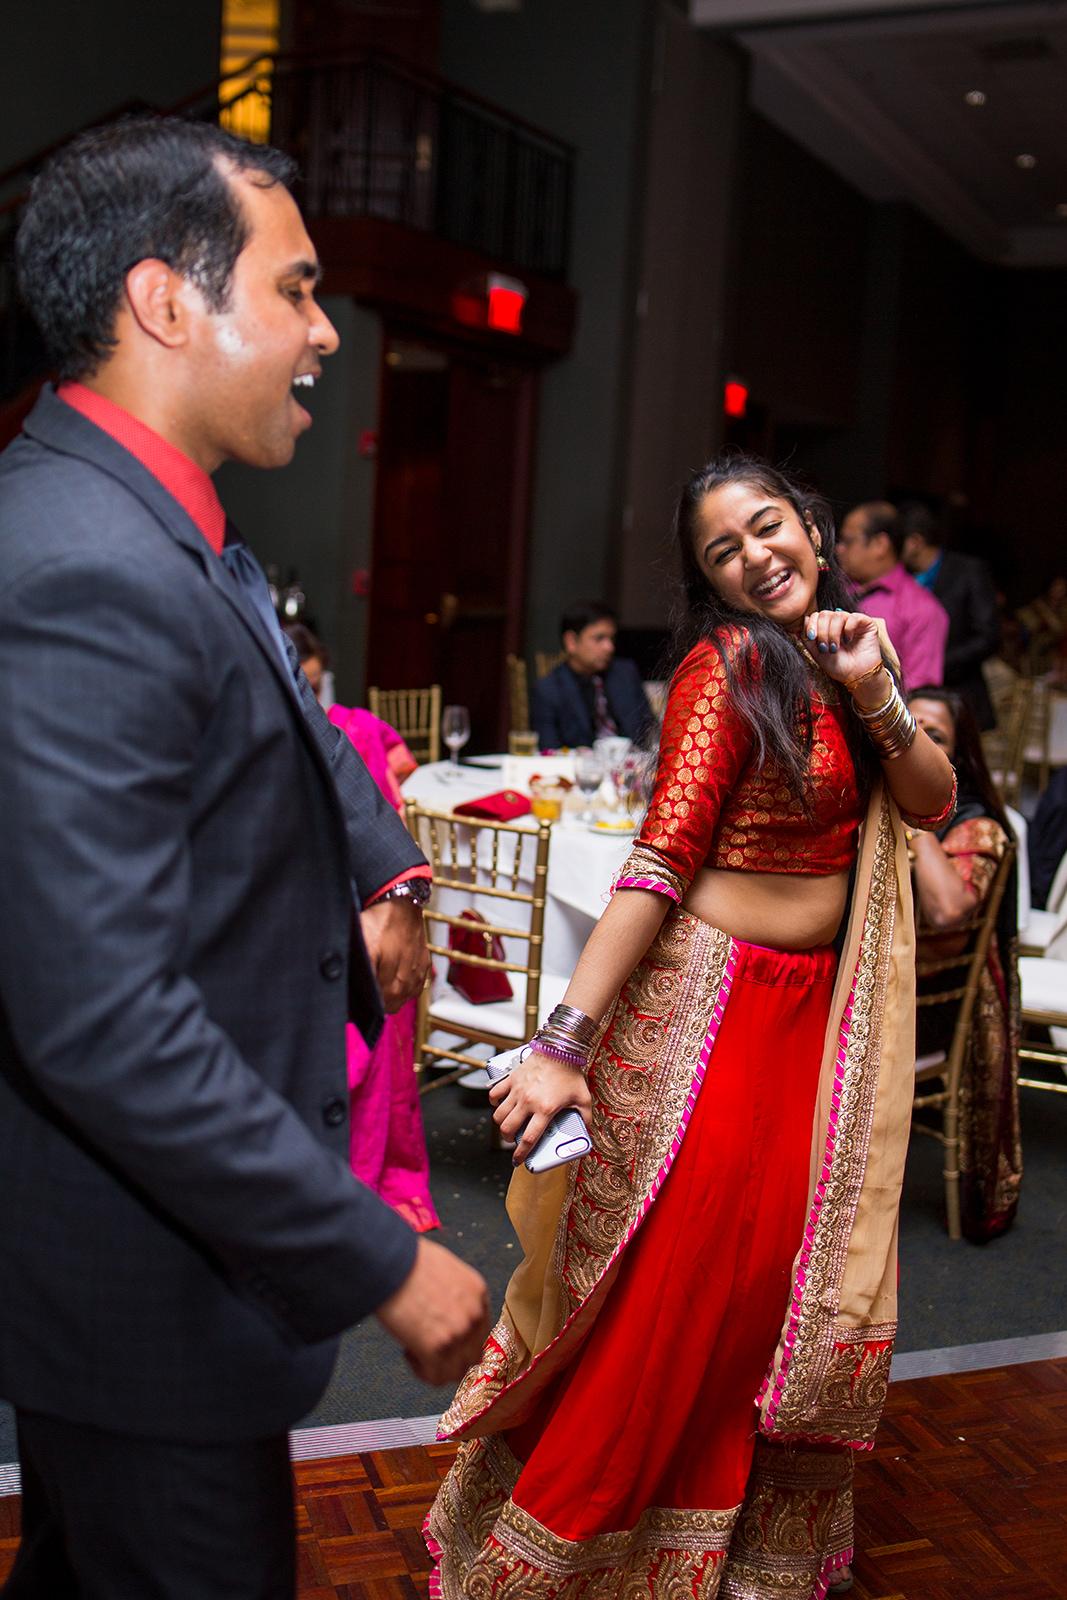 Le Cape Weddings - South Asian Wedding - Ishani and Sidhart - Wedding Reception-184.jpg